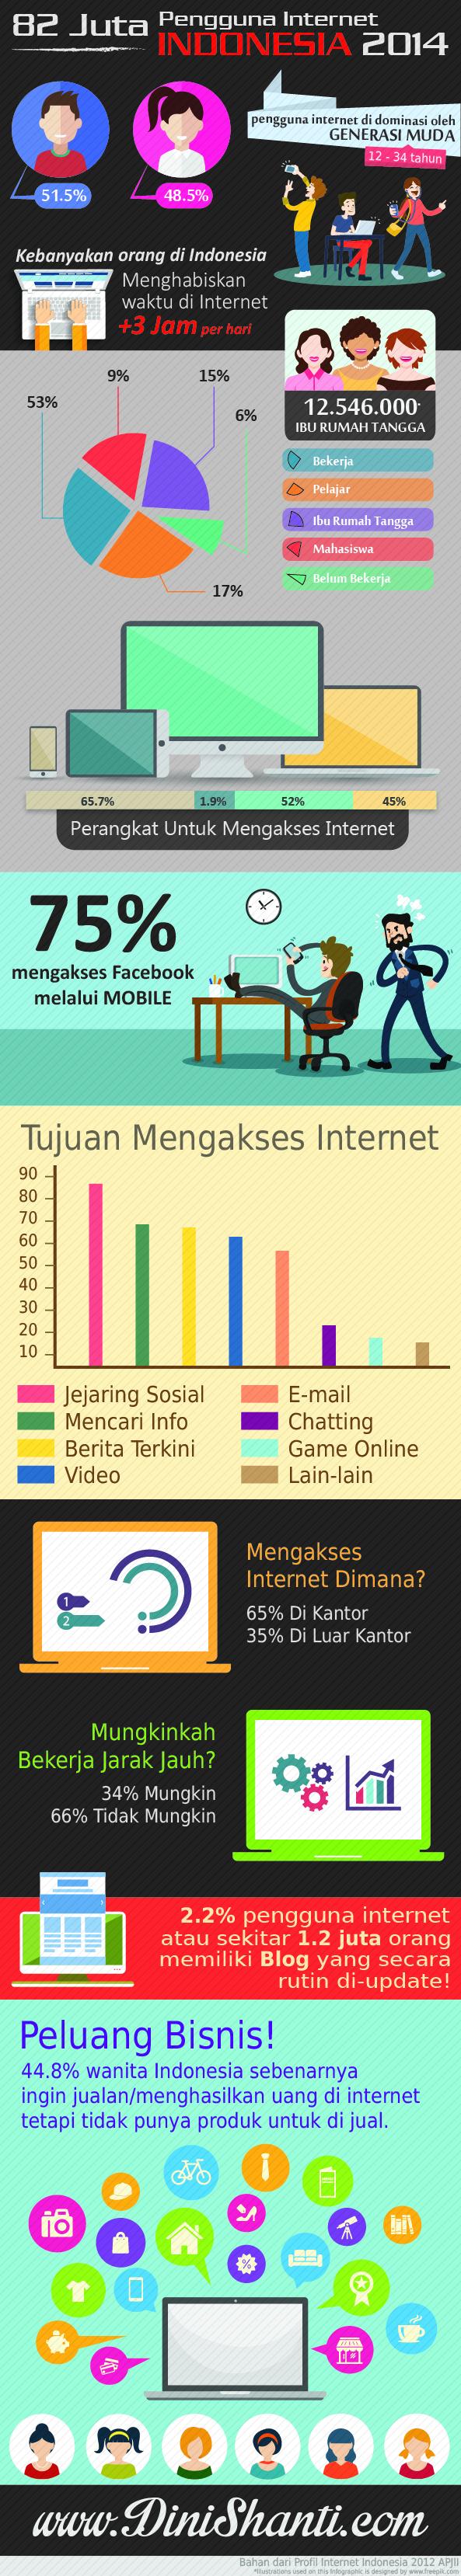 Infografis pengguna indonesia 2014.